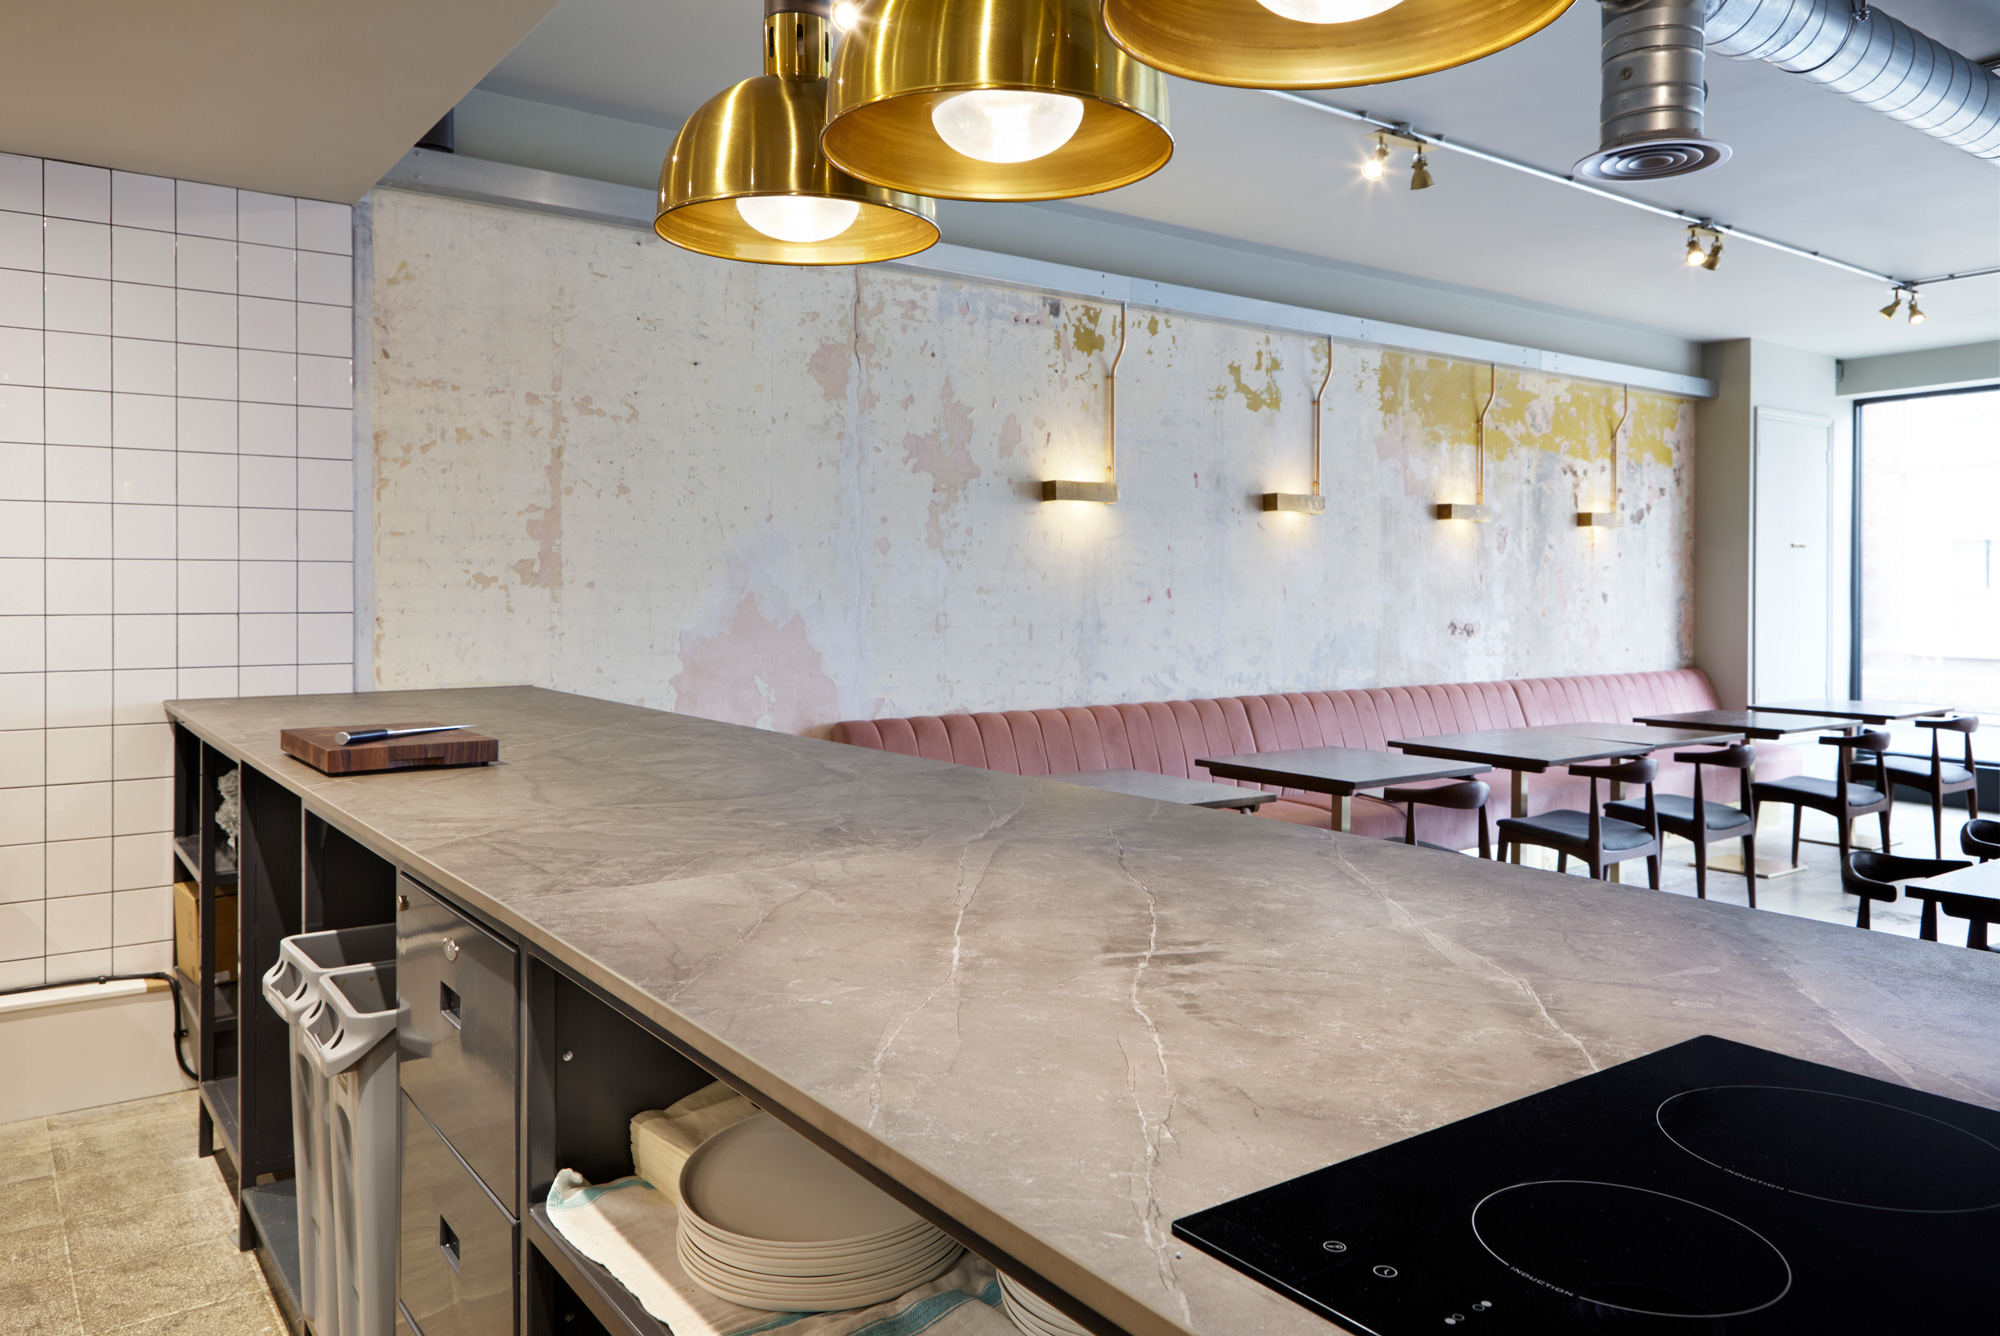 Vanderlyle restaurant  - Vanderlyle restaurant Dekton 5 53